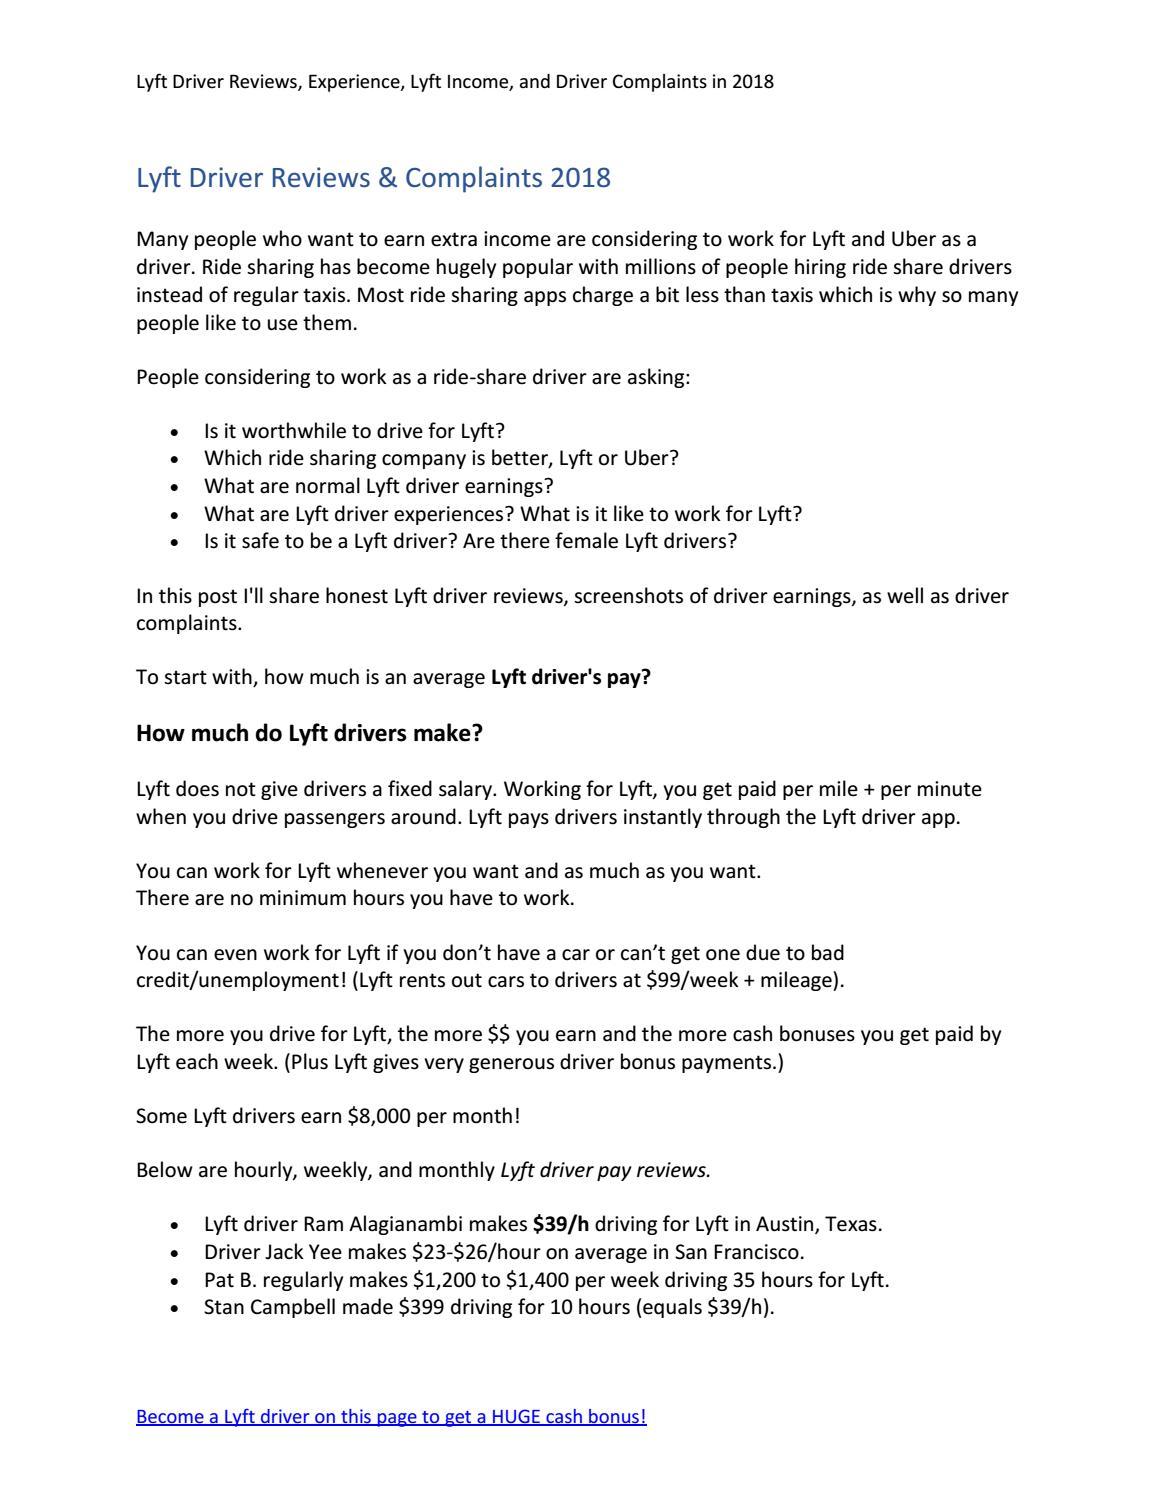 Lyft Driver Reviews & Complaints 2018 - Truth about Being a Lyft